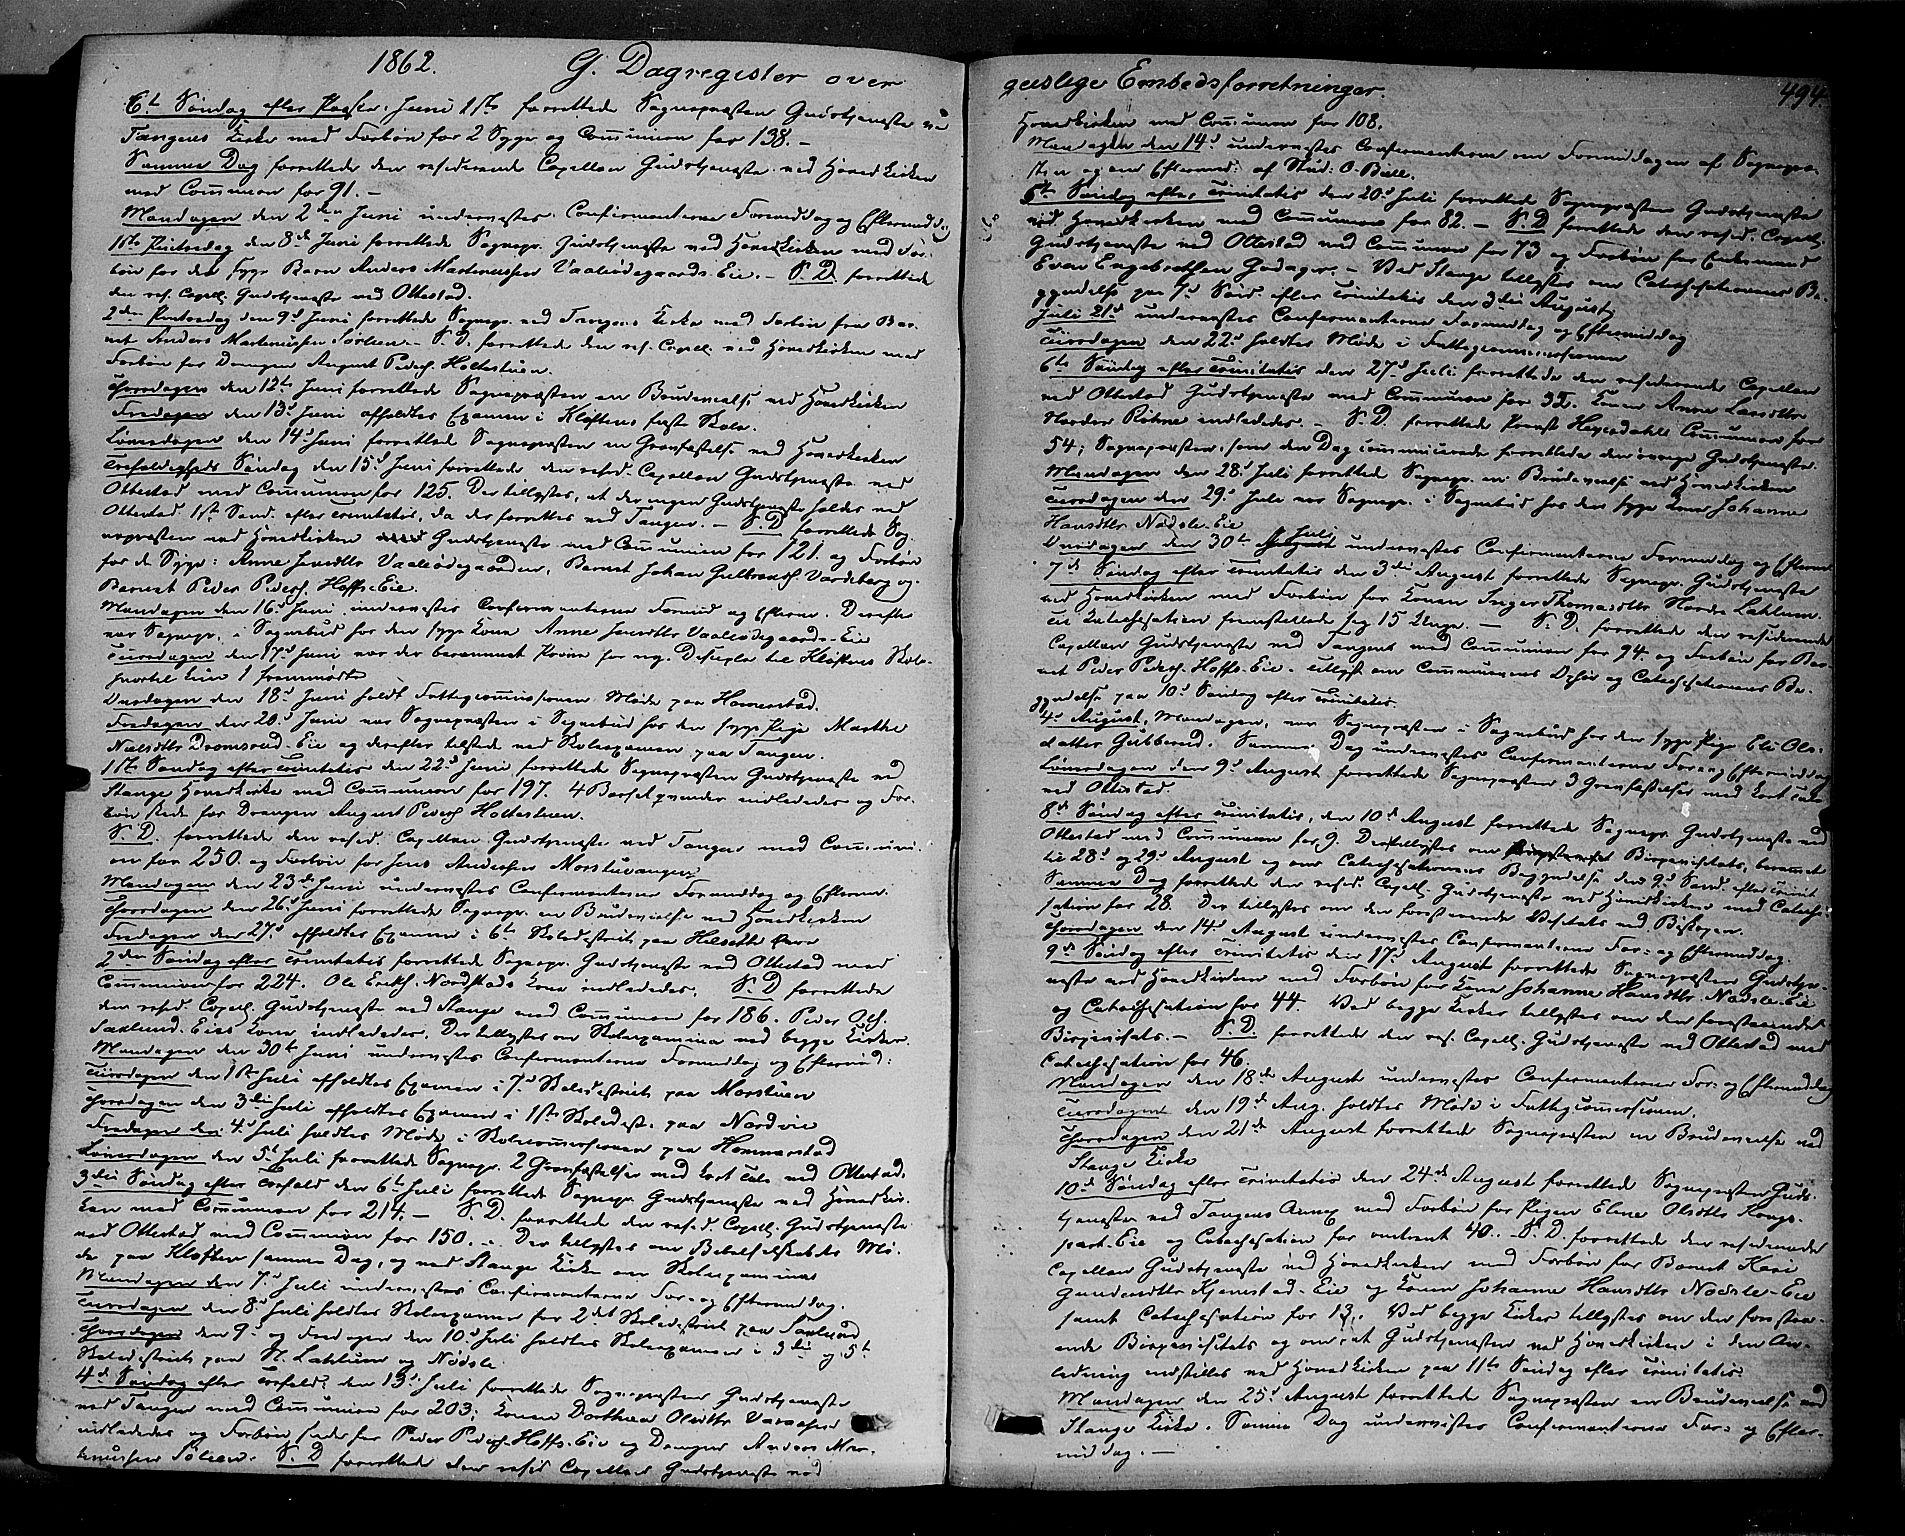 SAH, Stange prestekontor, K/L0013: Ministerialbok nr. 13, 1862-1879, s. 494